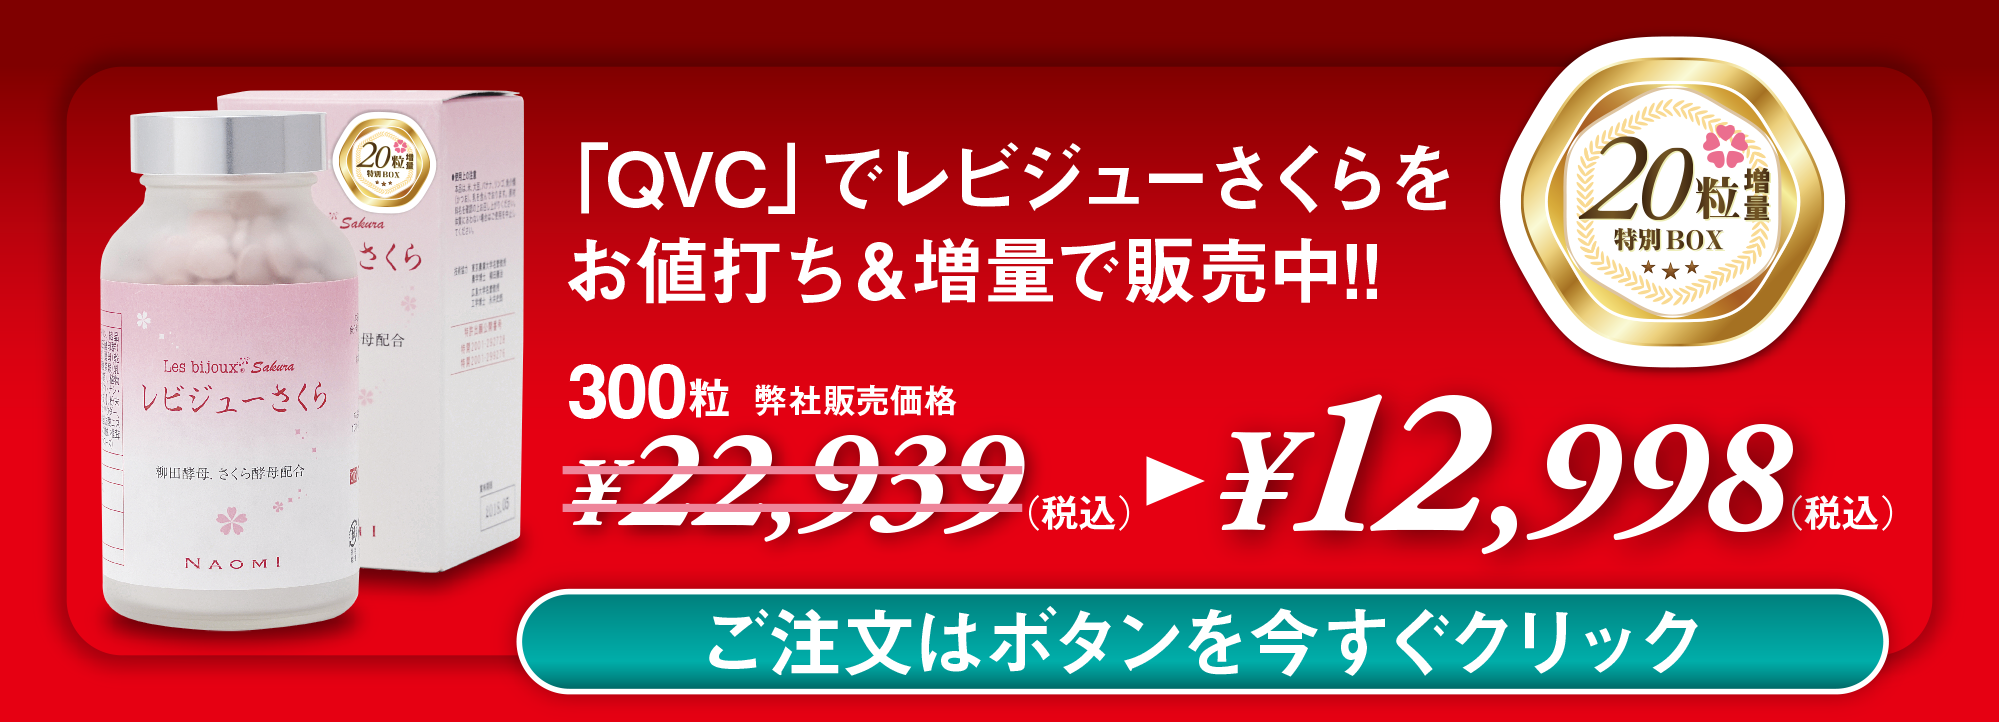 QVCでレビジューさくら320粒を増量・お値打ちで販売中